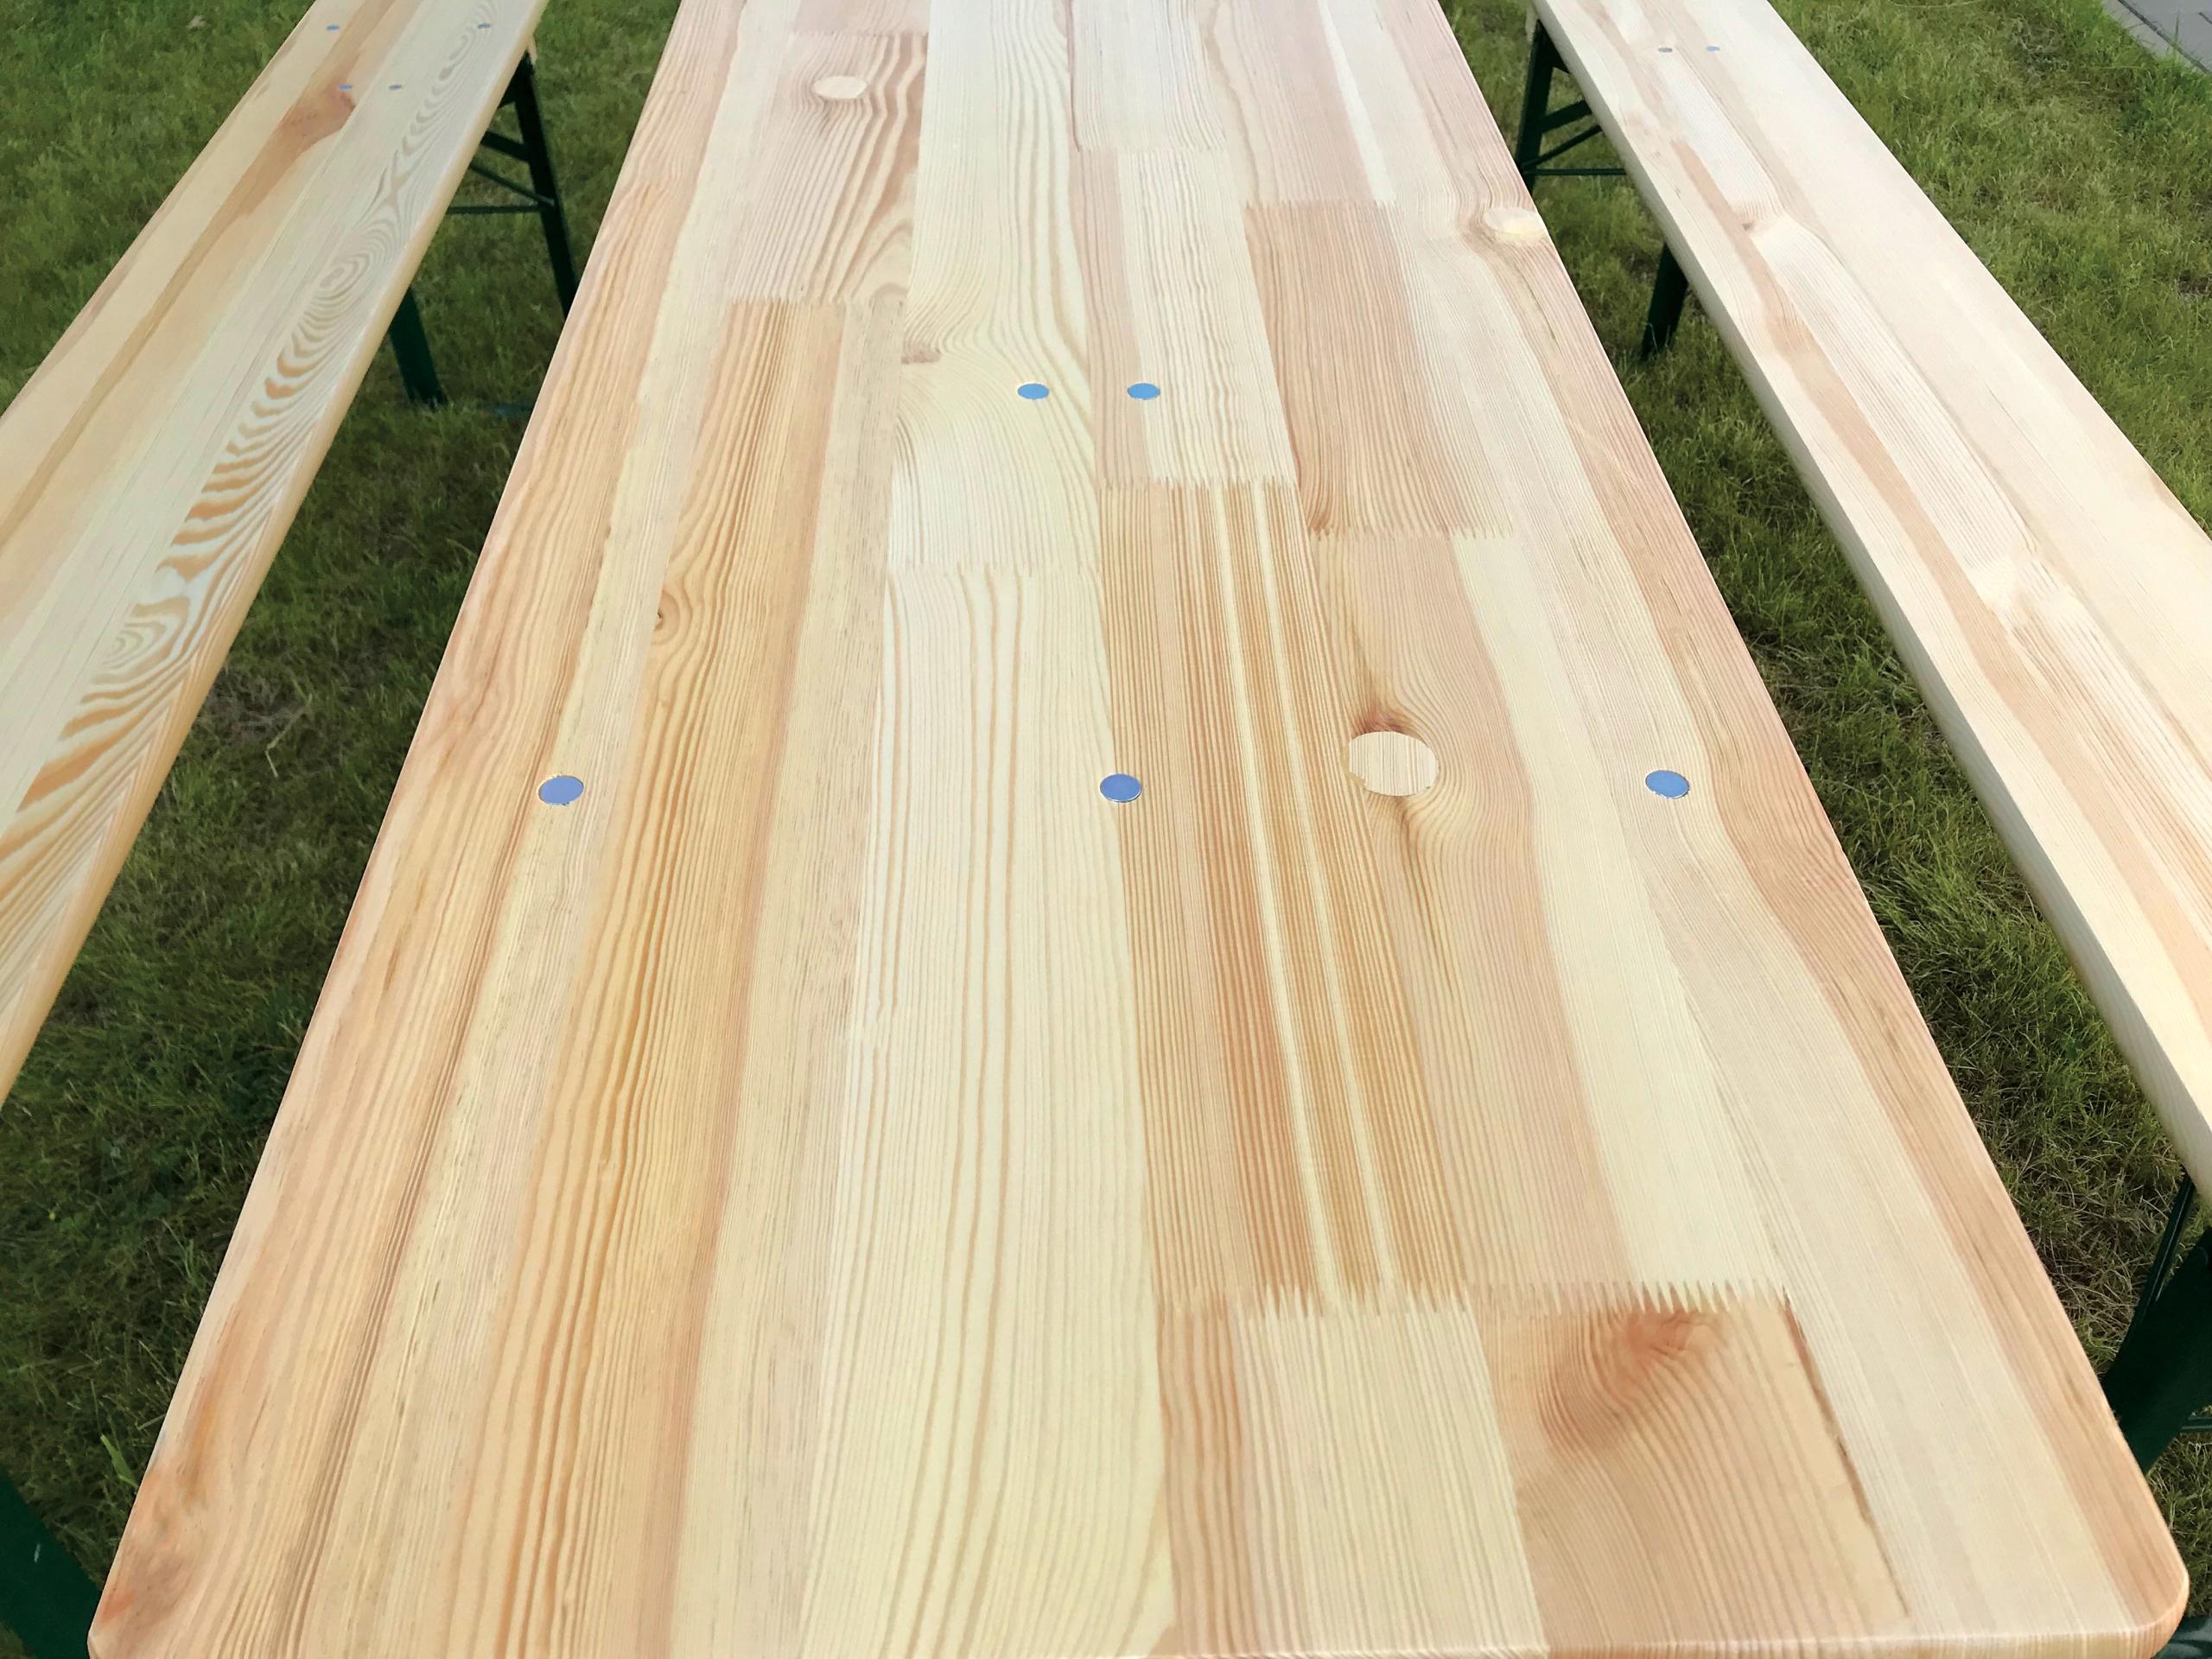 banketová sada pivná sada 80 cm stôl + 2 lavice Kód produktu banketová sada 220x80